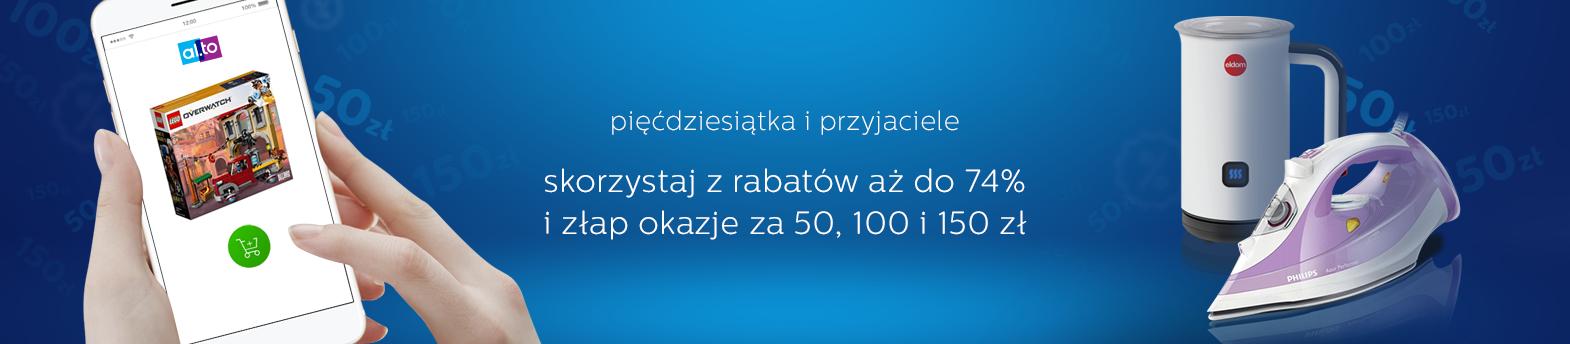 promocja 50, 100 i 150 zł